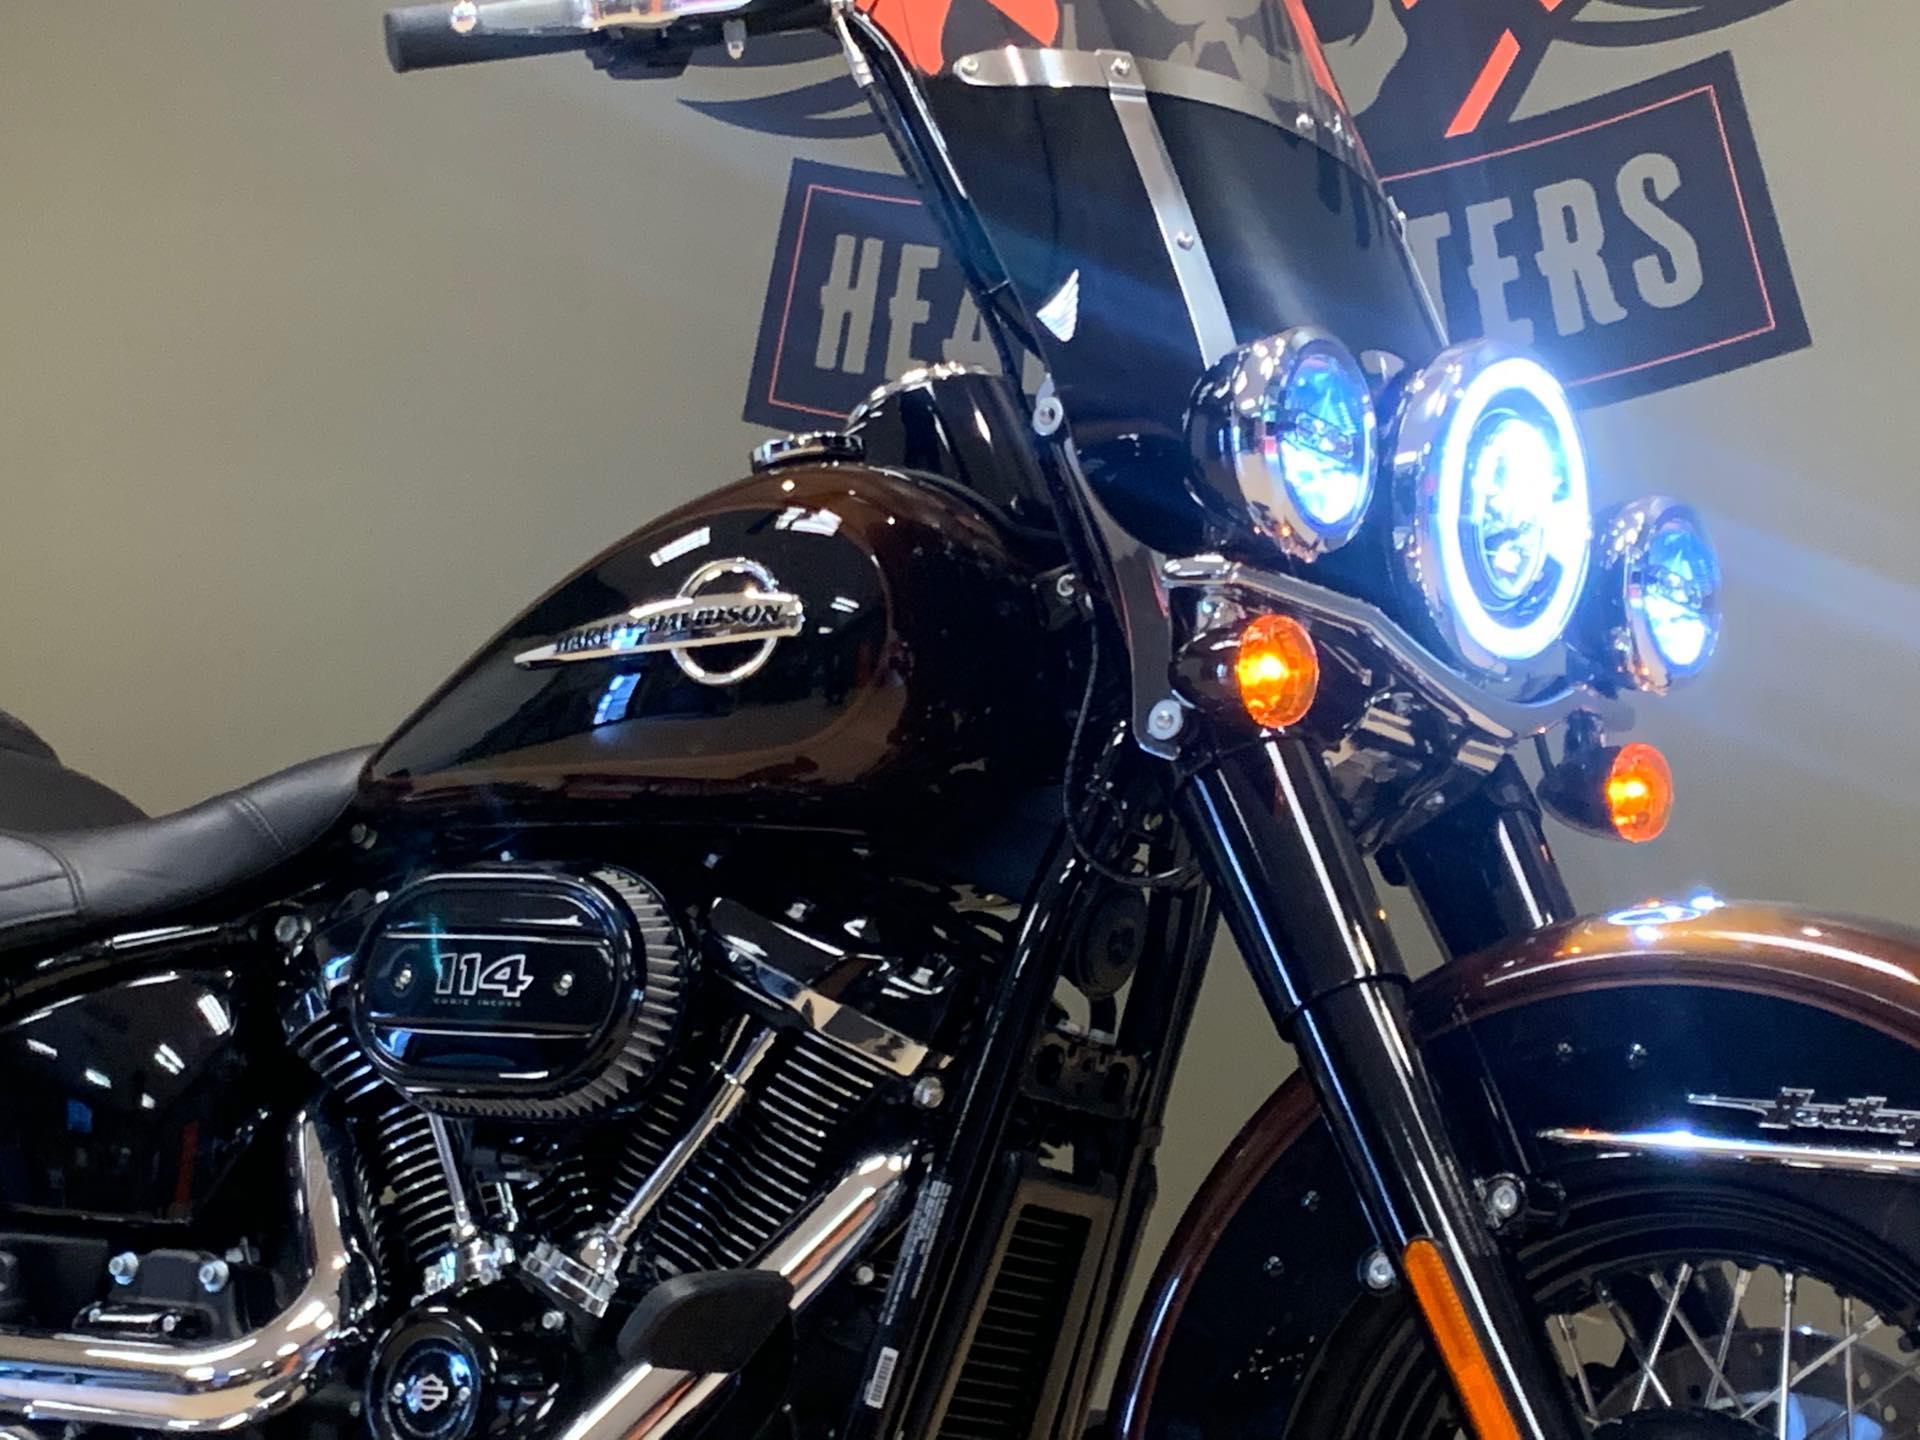 2019 Harley-Davidson Softail Heritage Classic 114 at Loess Hills Harley-Davidson